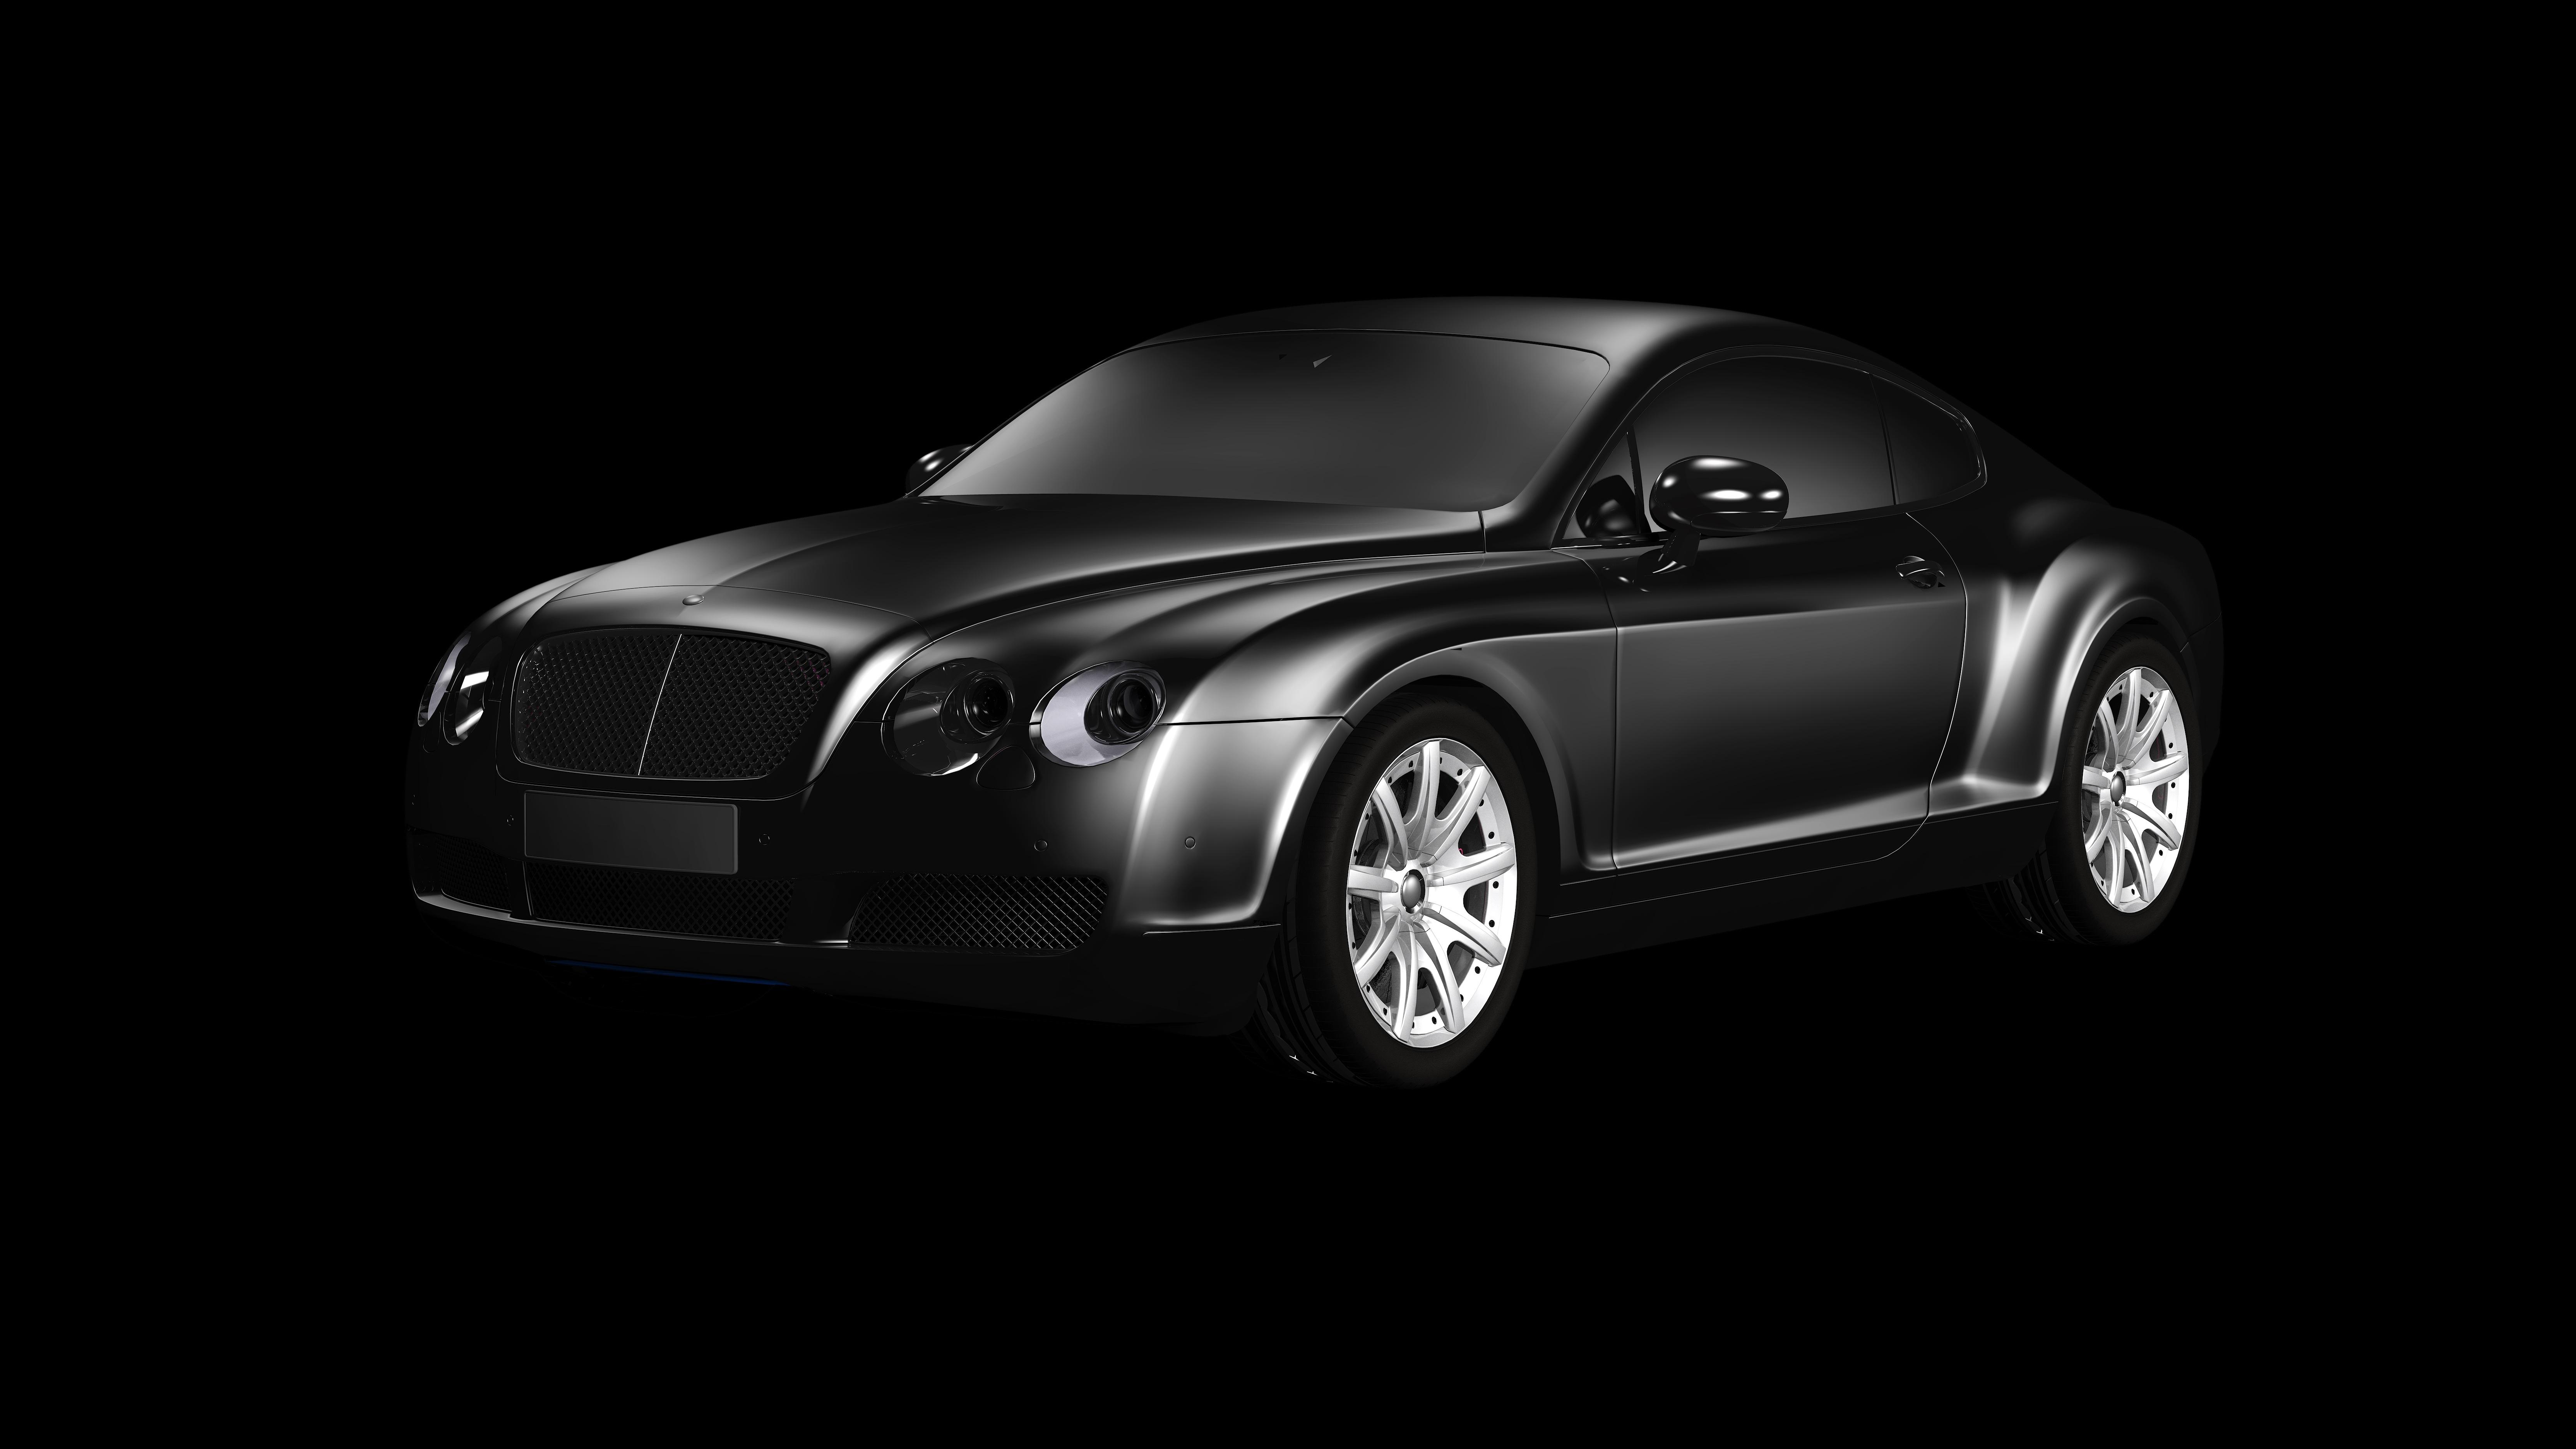 Free Images Light Wheel Atmosphere Studio Auto Black Bumper